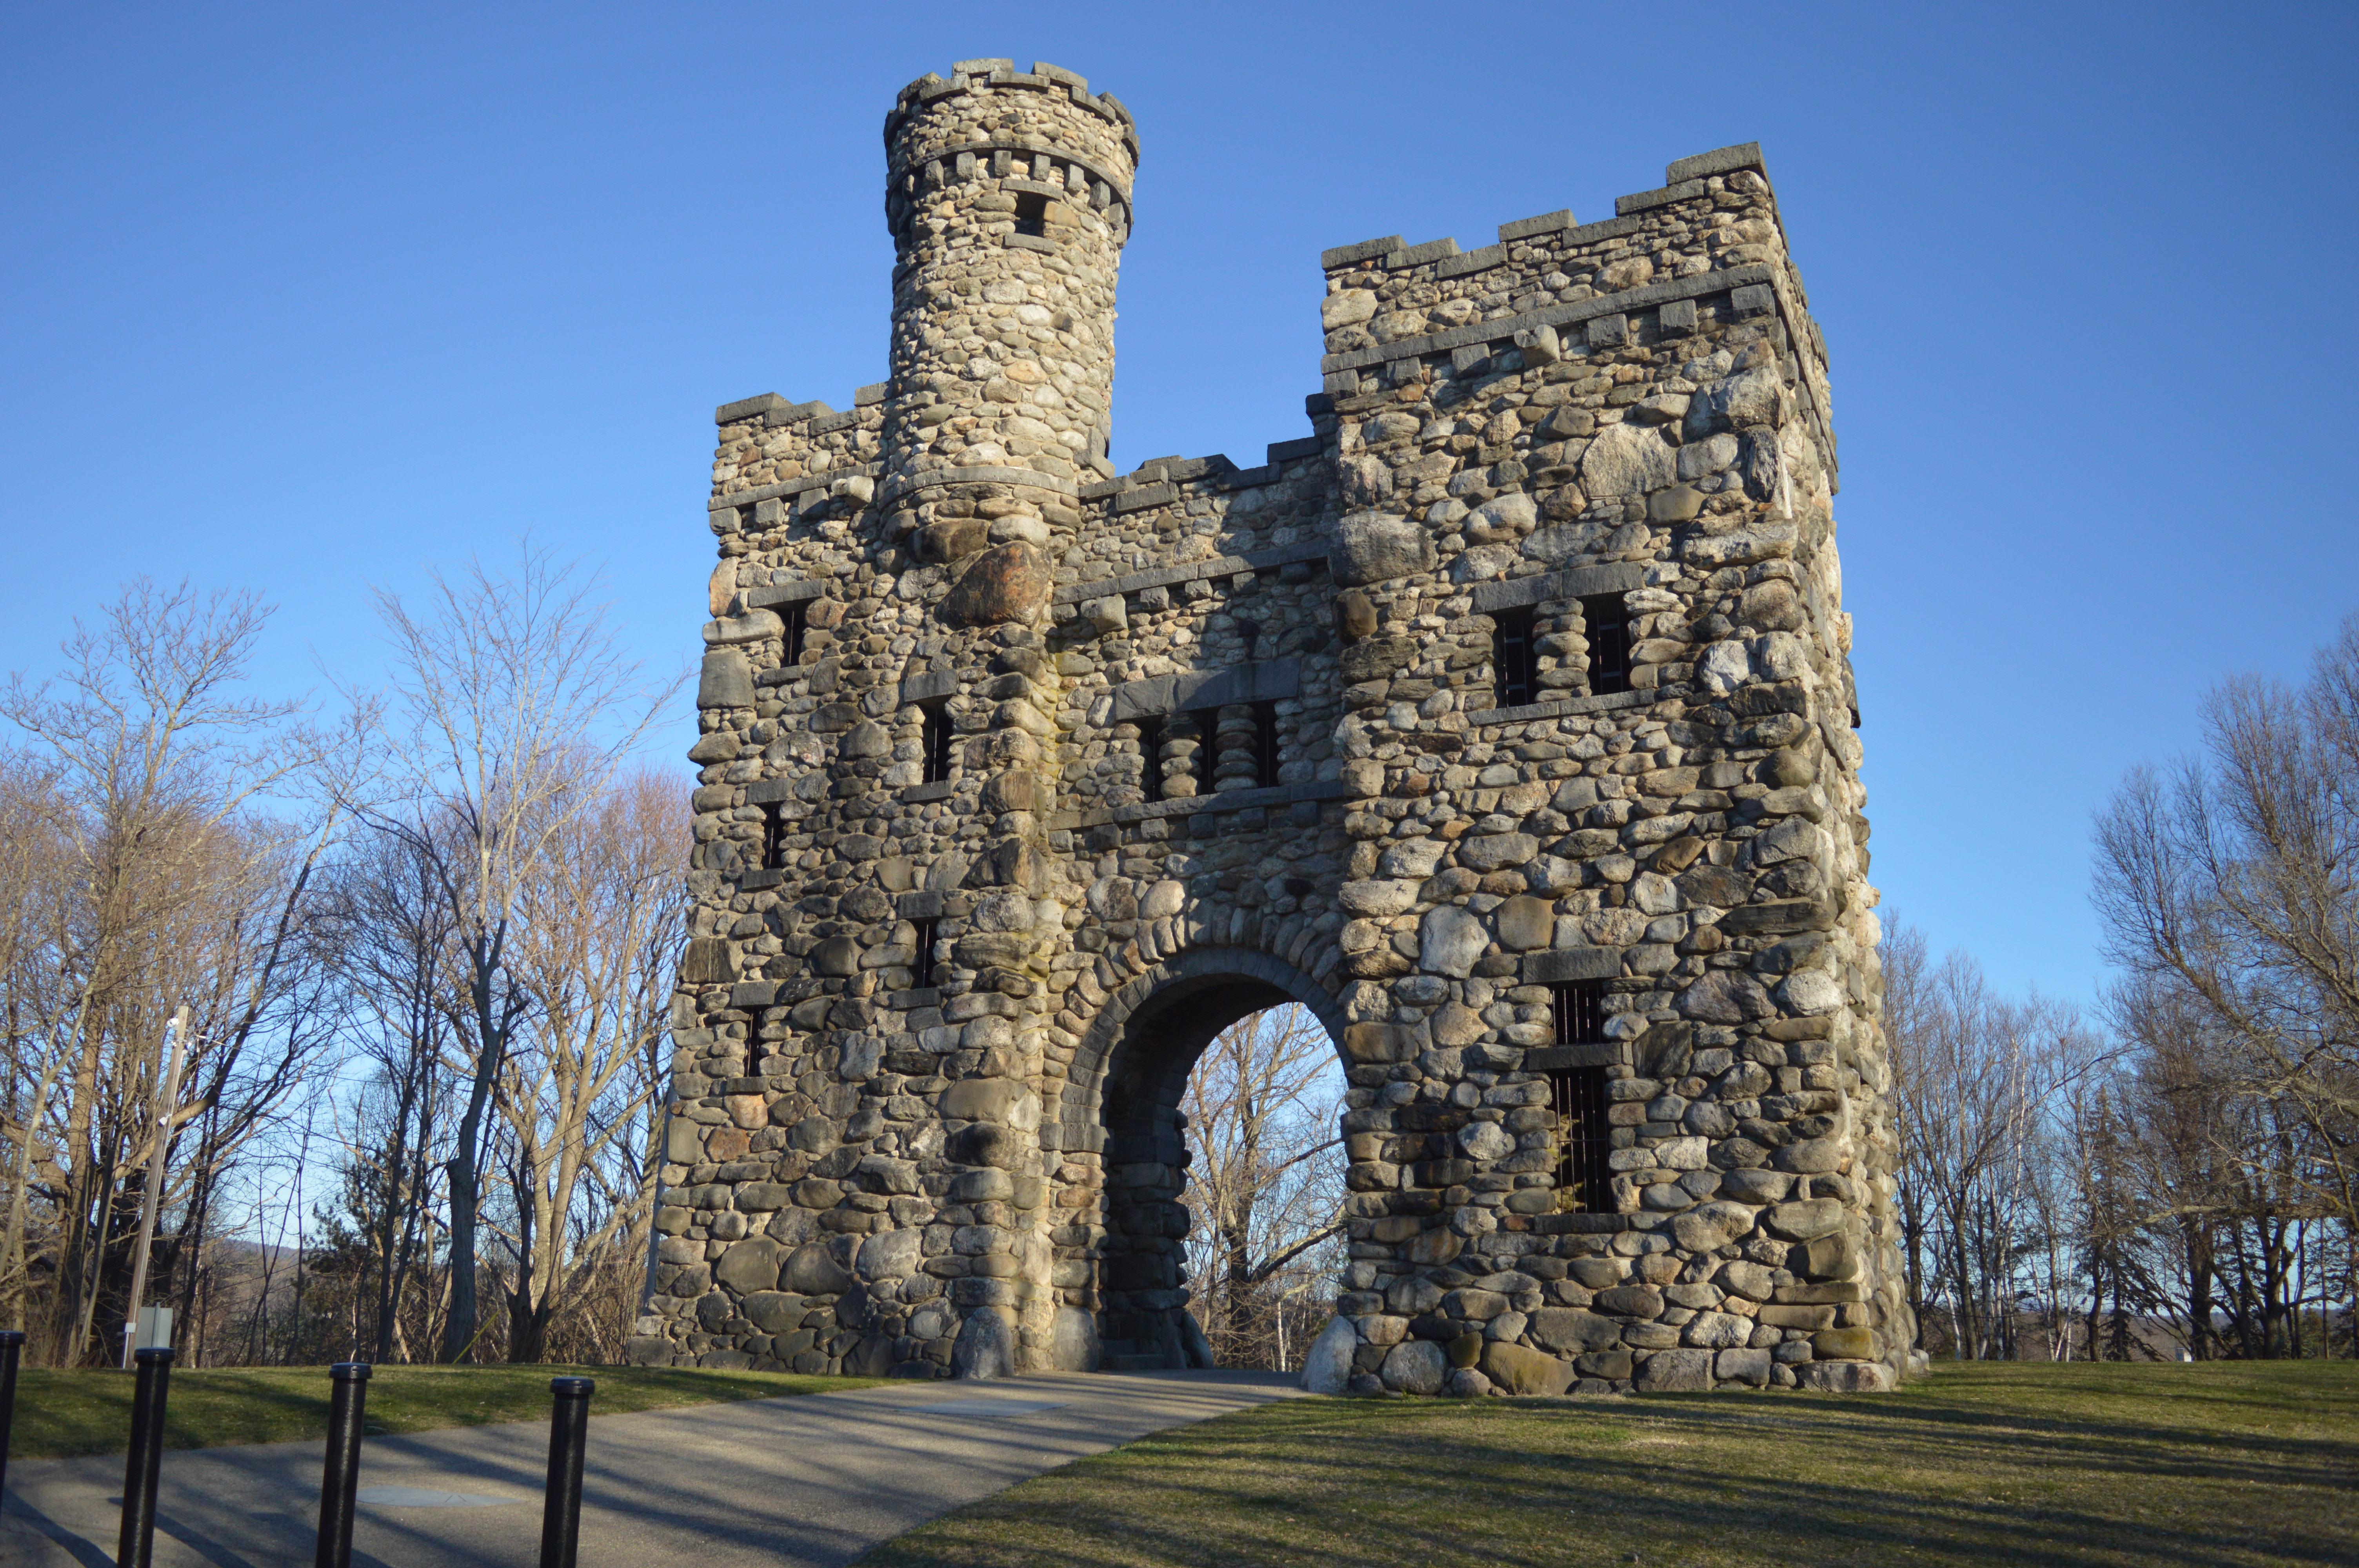 architecture | New England Nomad